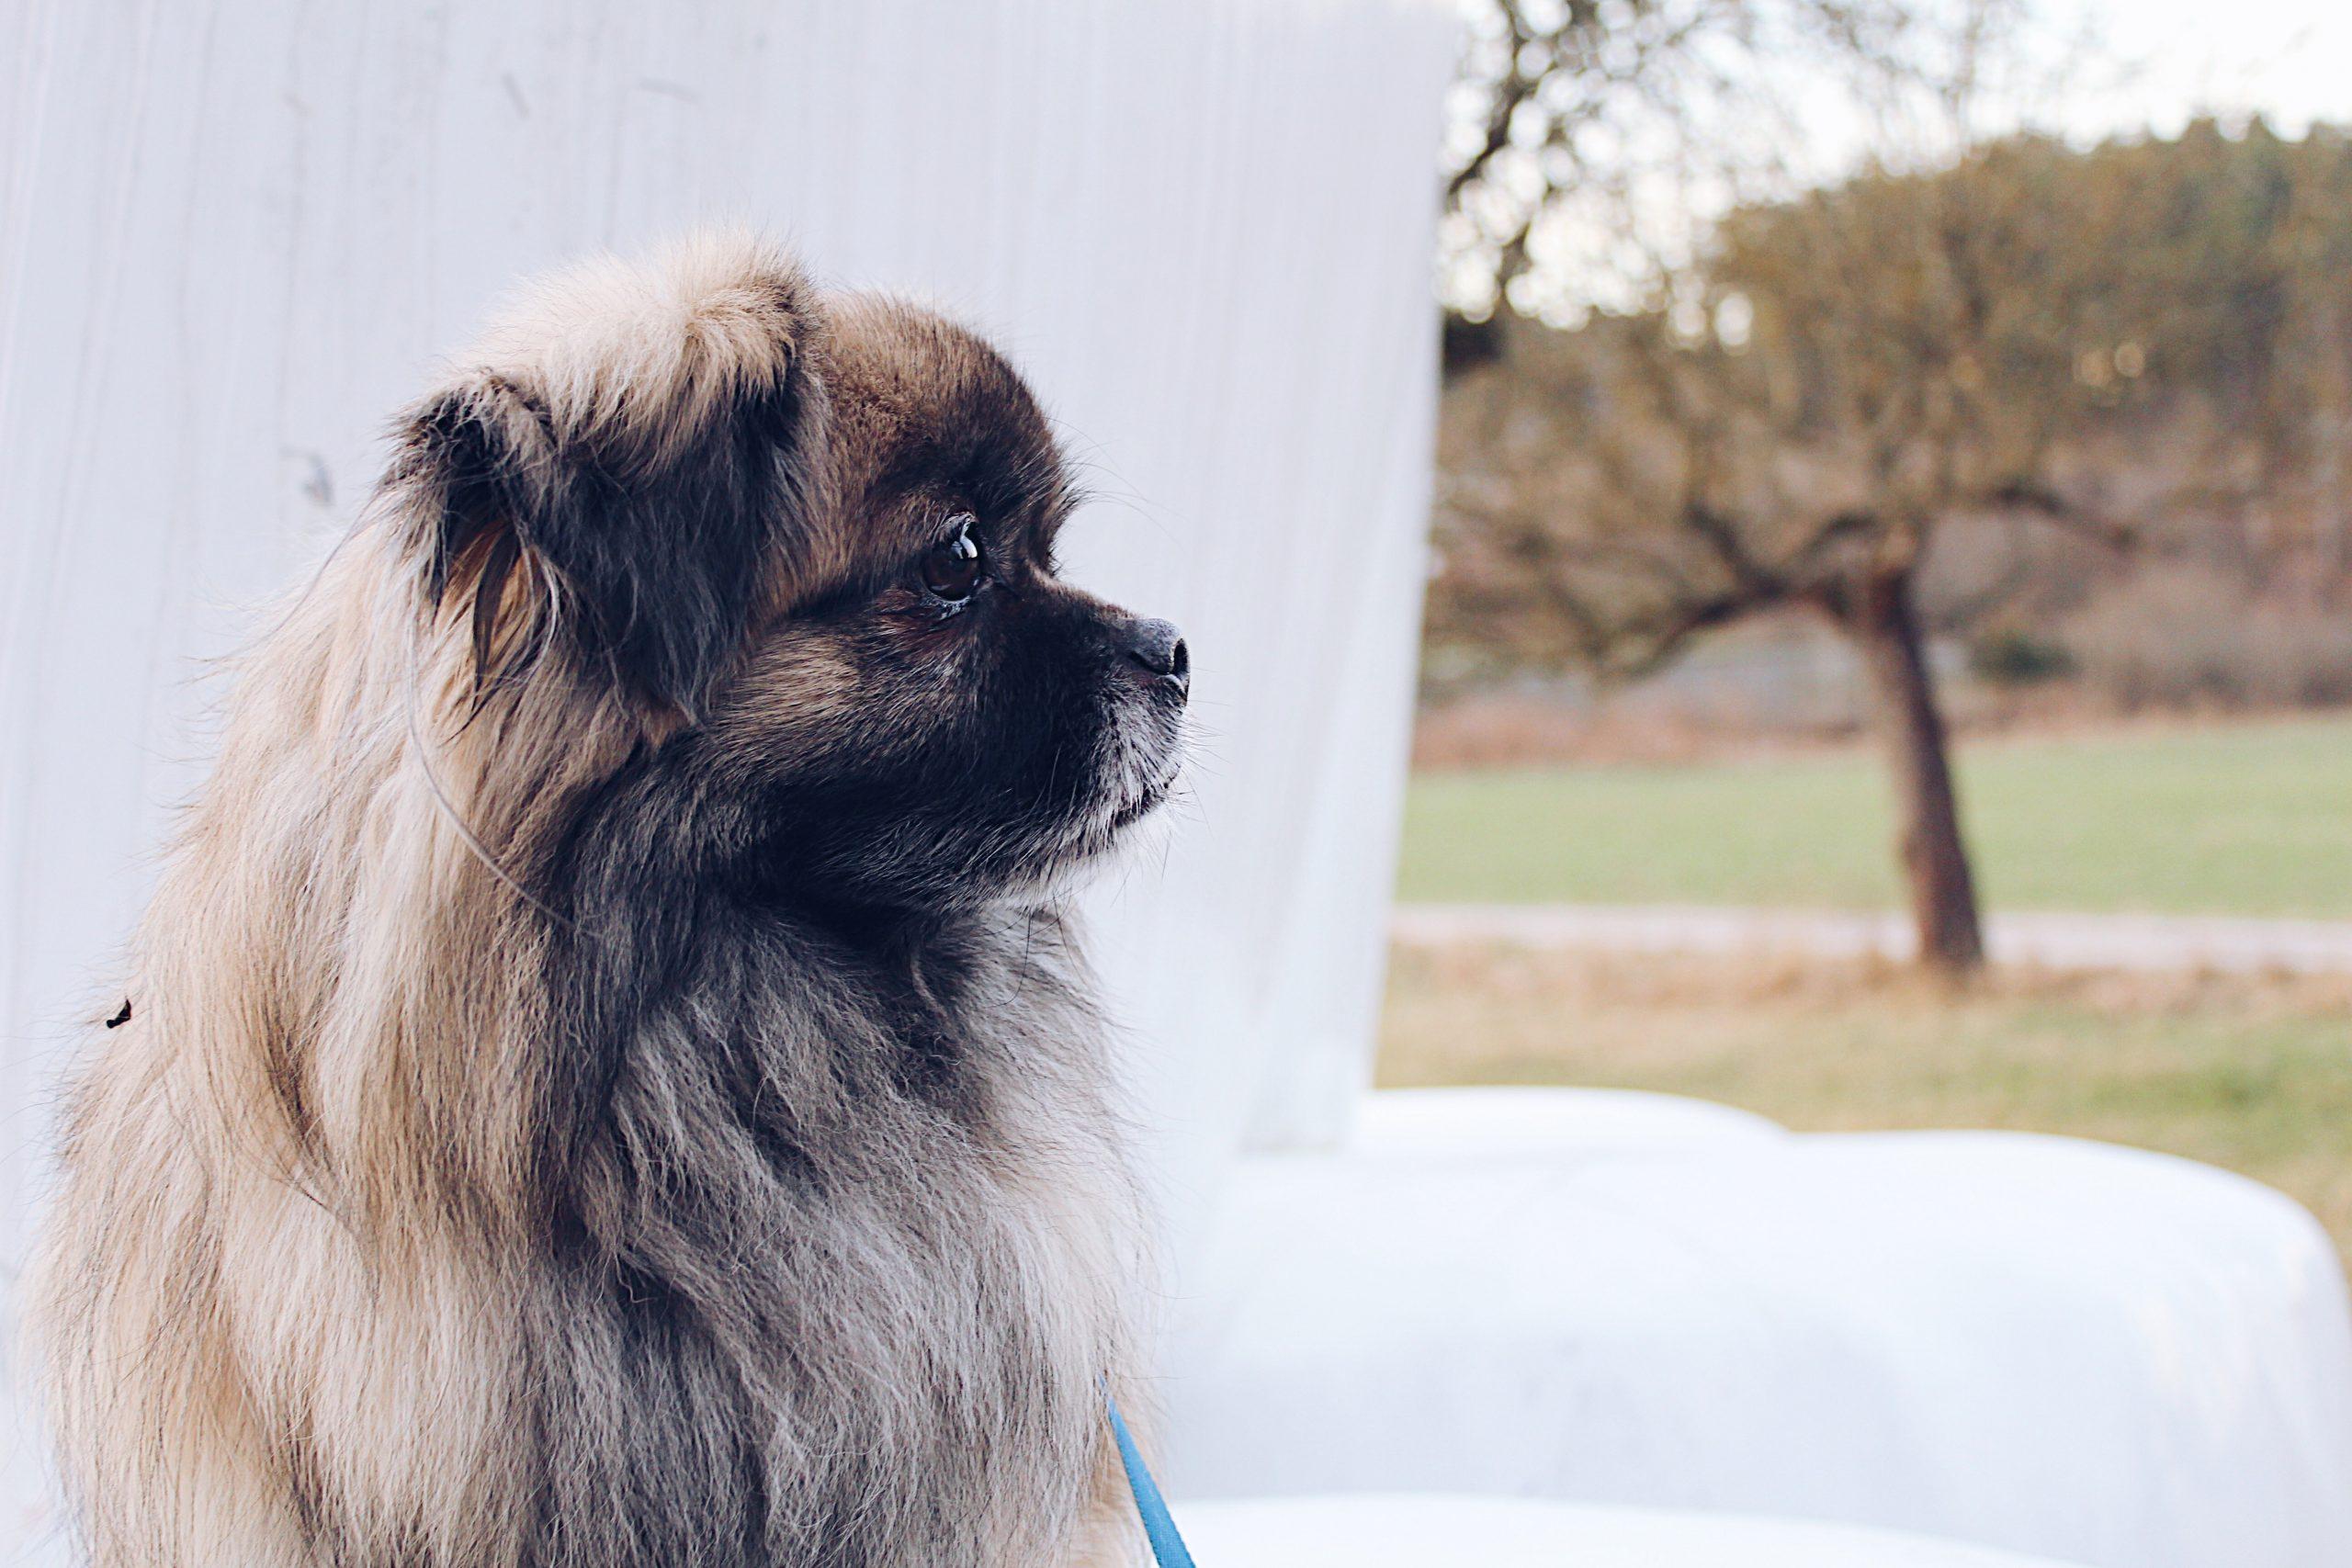 16 Dogs That Look Like Lions - Pekingese